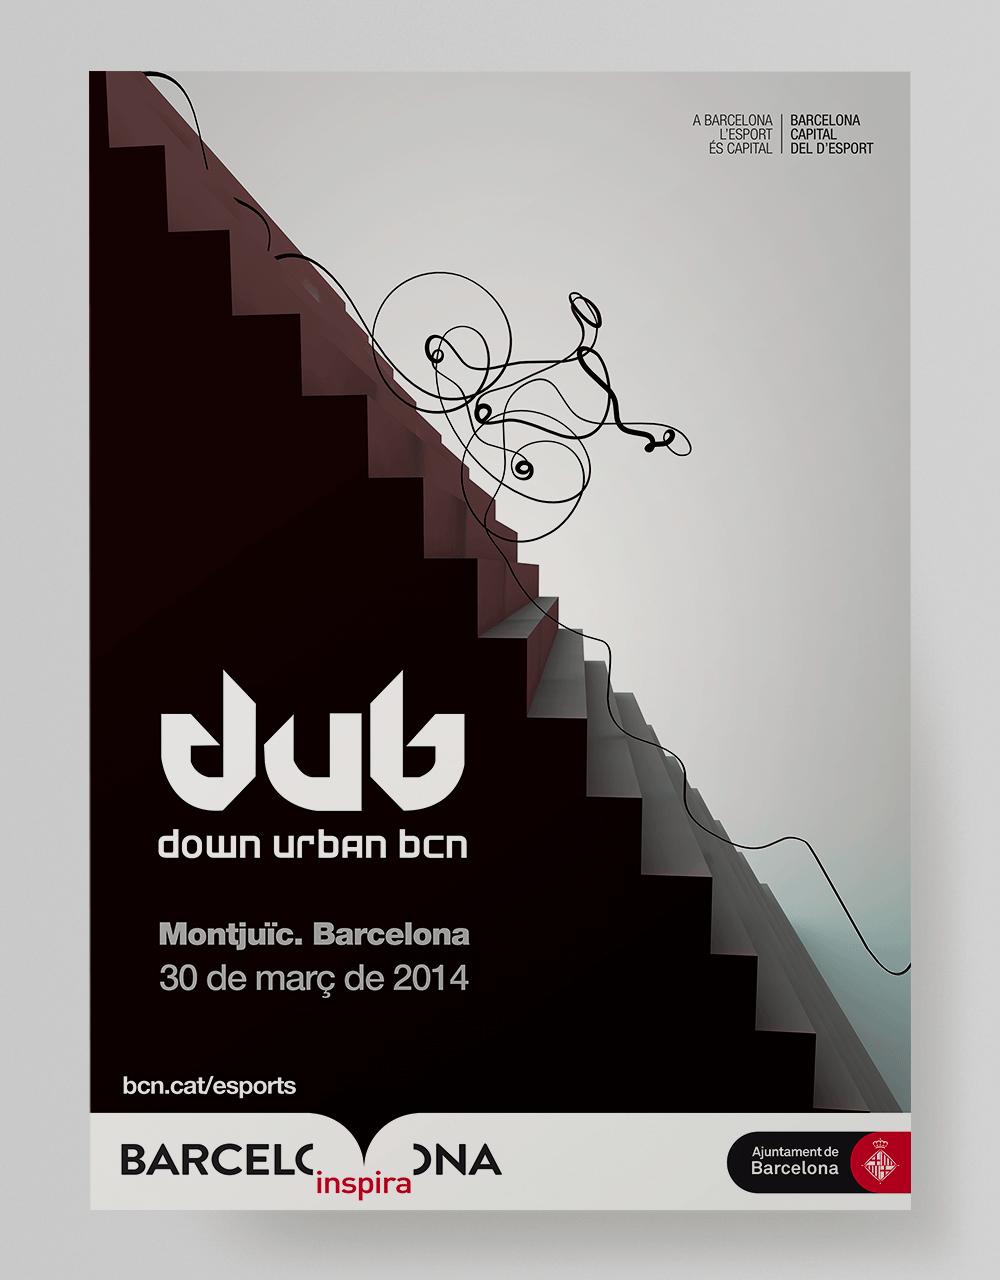 Posters_DUB_downUrbanBarcelona_BCN_Esports